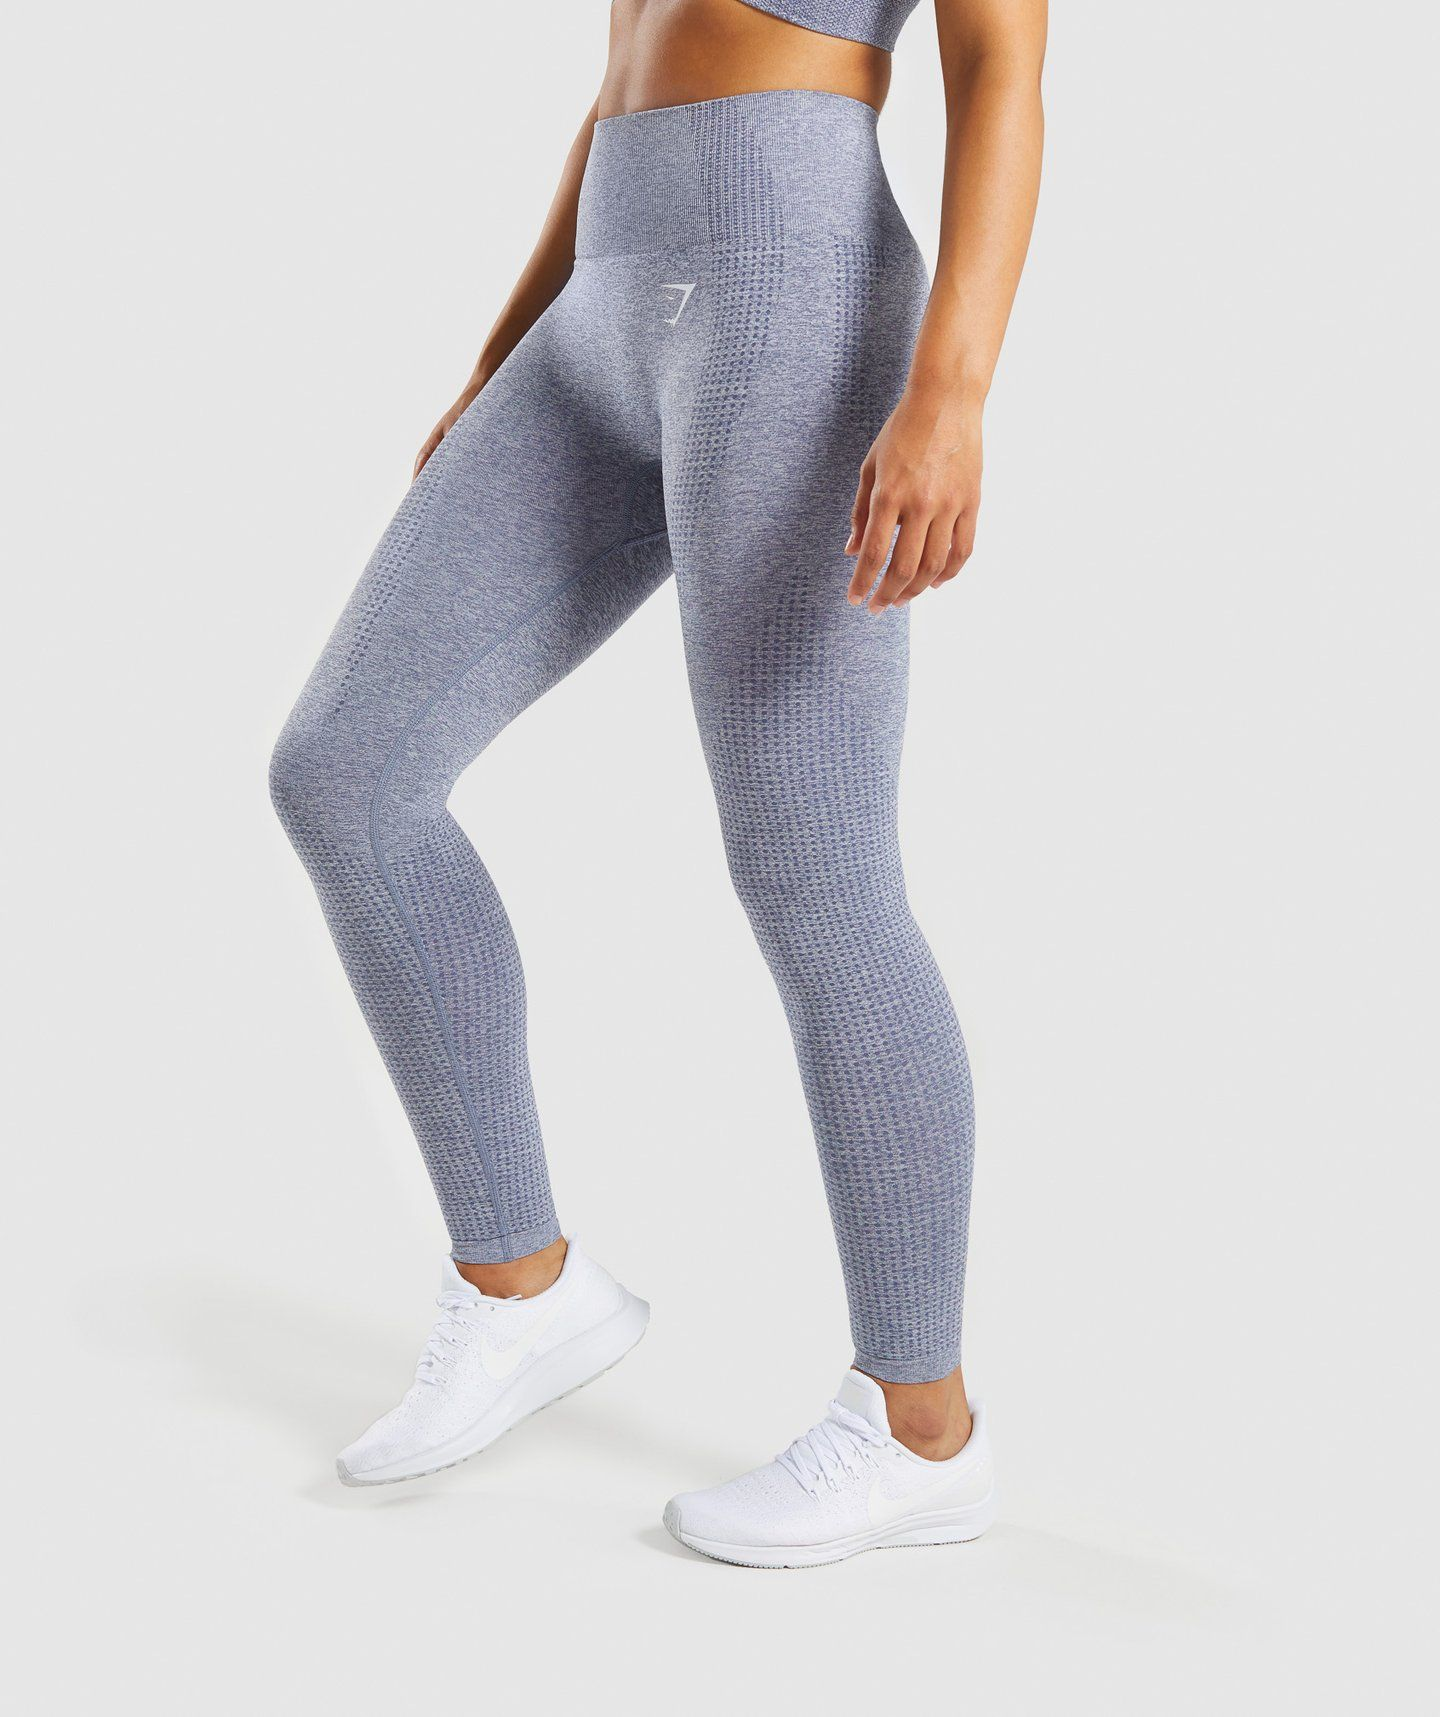 aa9bd2a7e5e1f0 Gymshark Vital Seamless Leggings - Steel Blue Marl in 2019 | Clothes ...